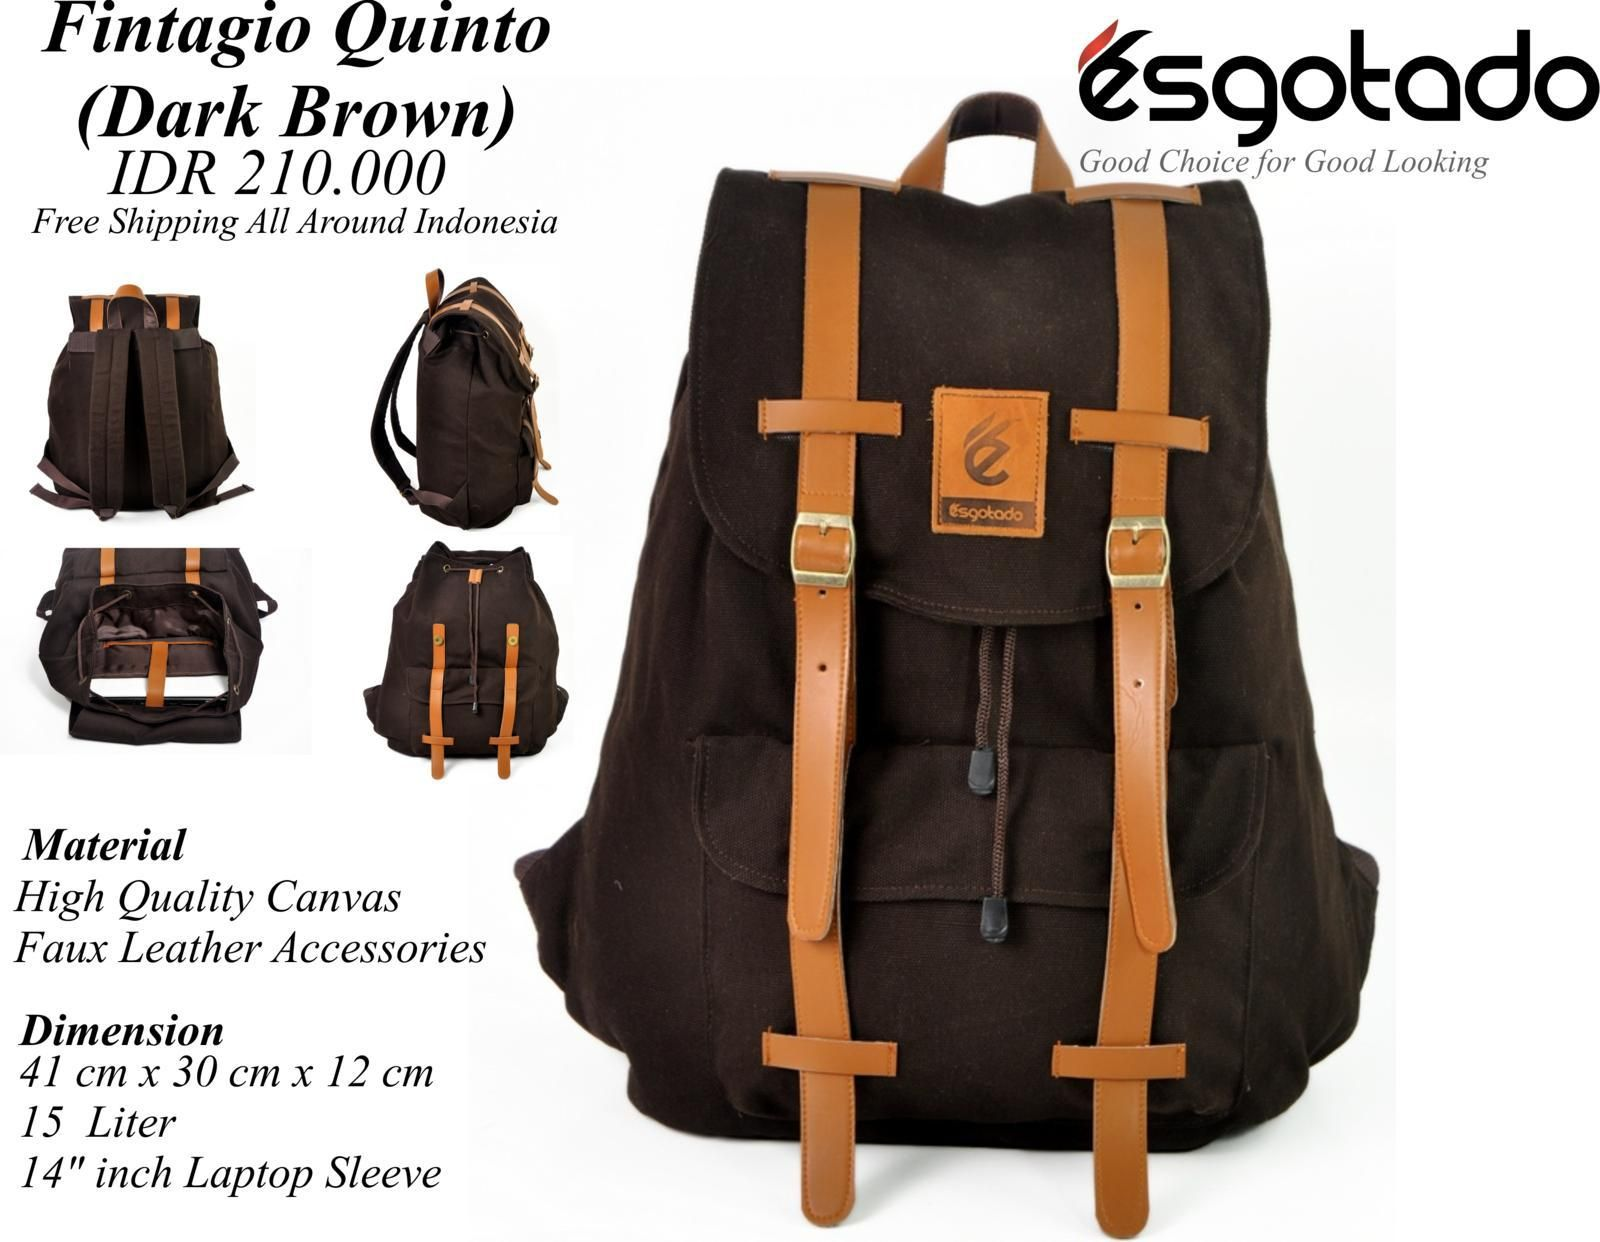 FINTAGIO QUINTO DARK BROWN sms/whatsapp: 082219180163 pin: 7DD85355 (full) BBM CHANNEL: C002012CF LINE: cs.esgotado